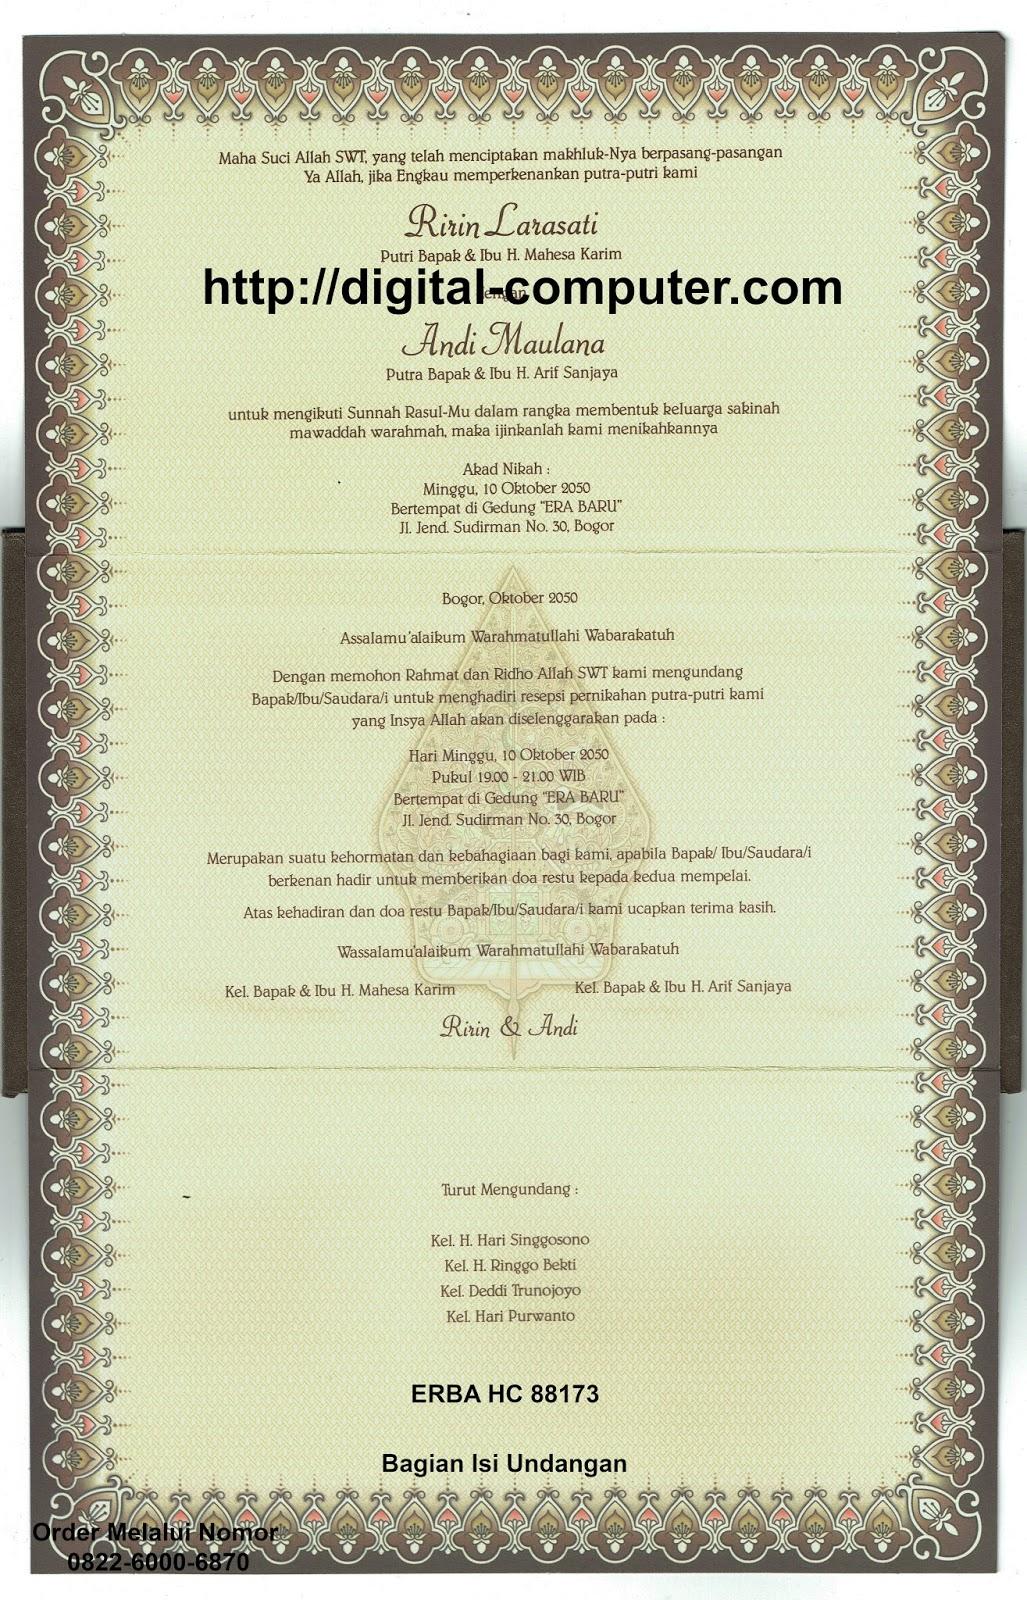 undangan hardcover HC-88173